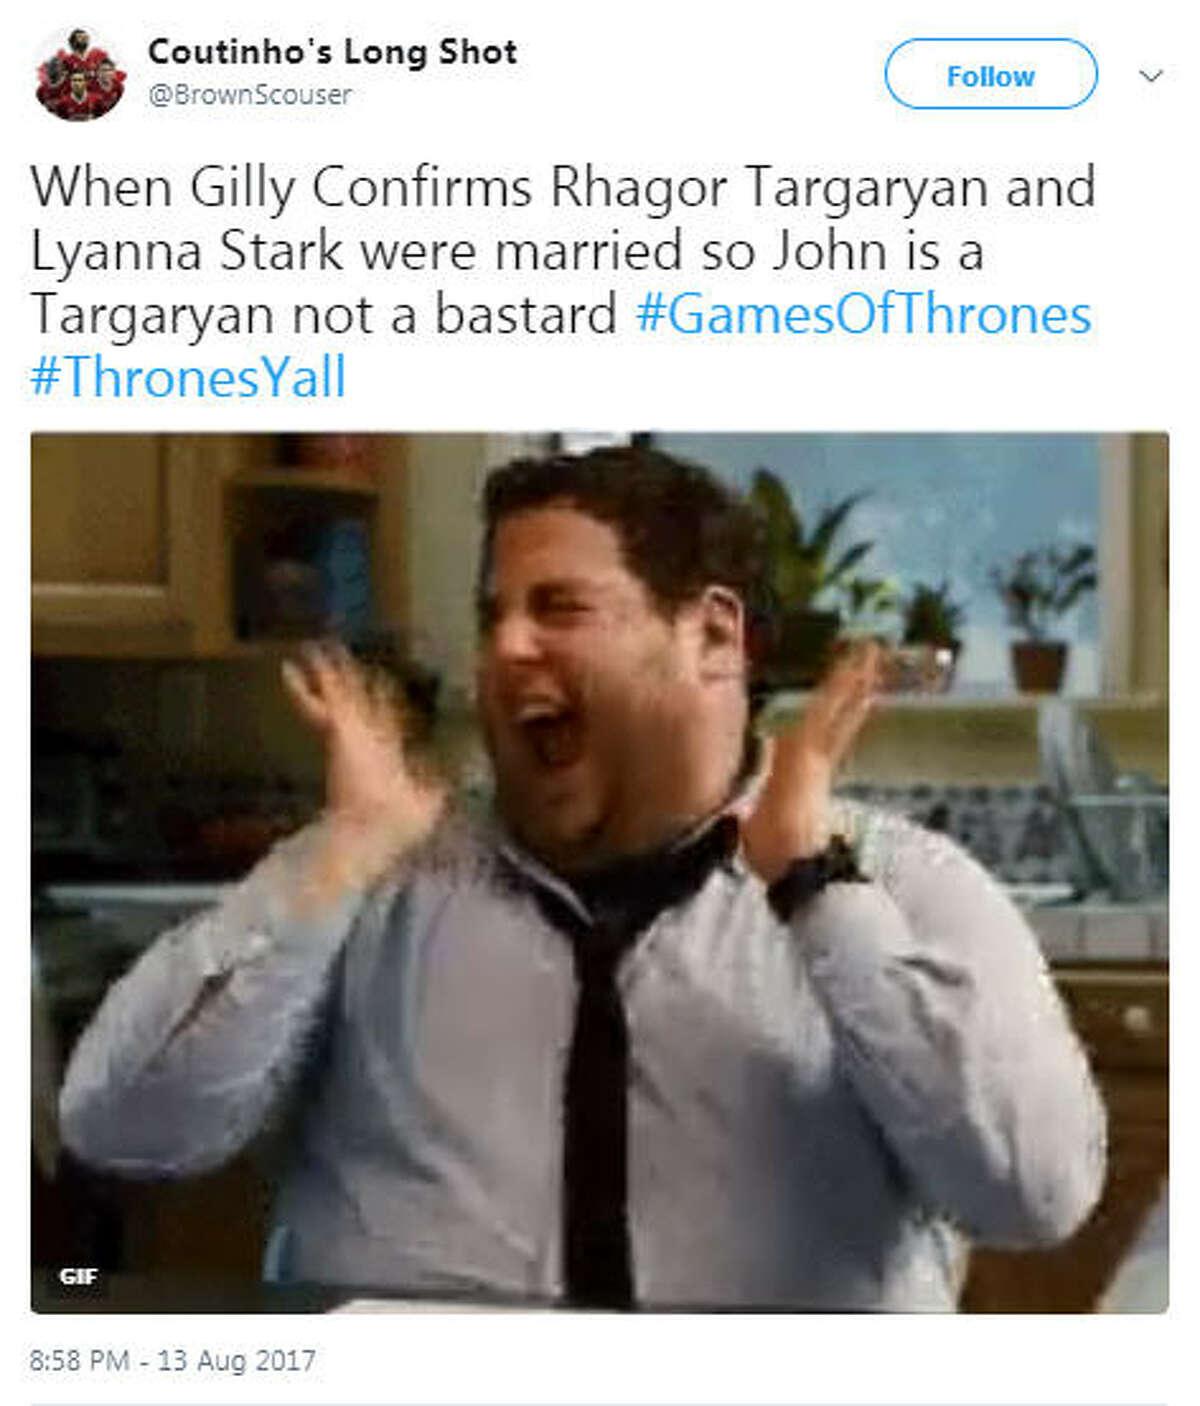 """When Gilly Confirms Rhagor Targaryan and Lyanna Stark were married so John is a Targaryan not a bastard #GamesOfThrones #ThronesYall"" Source: Twitter"